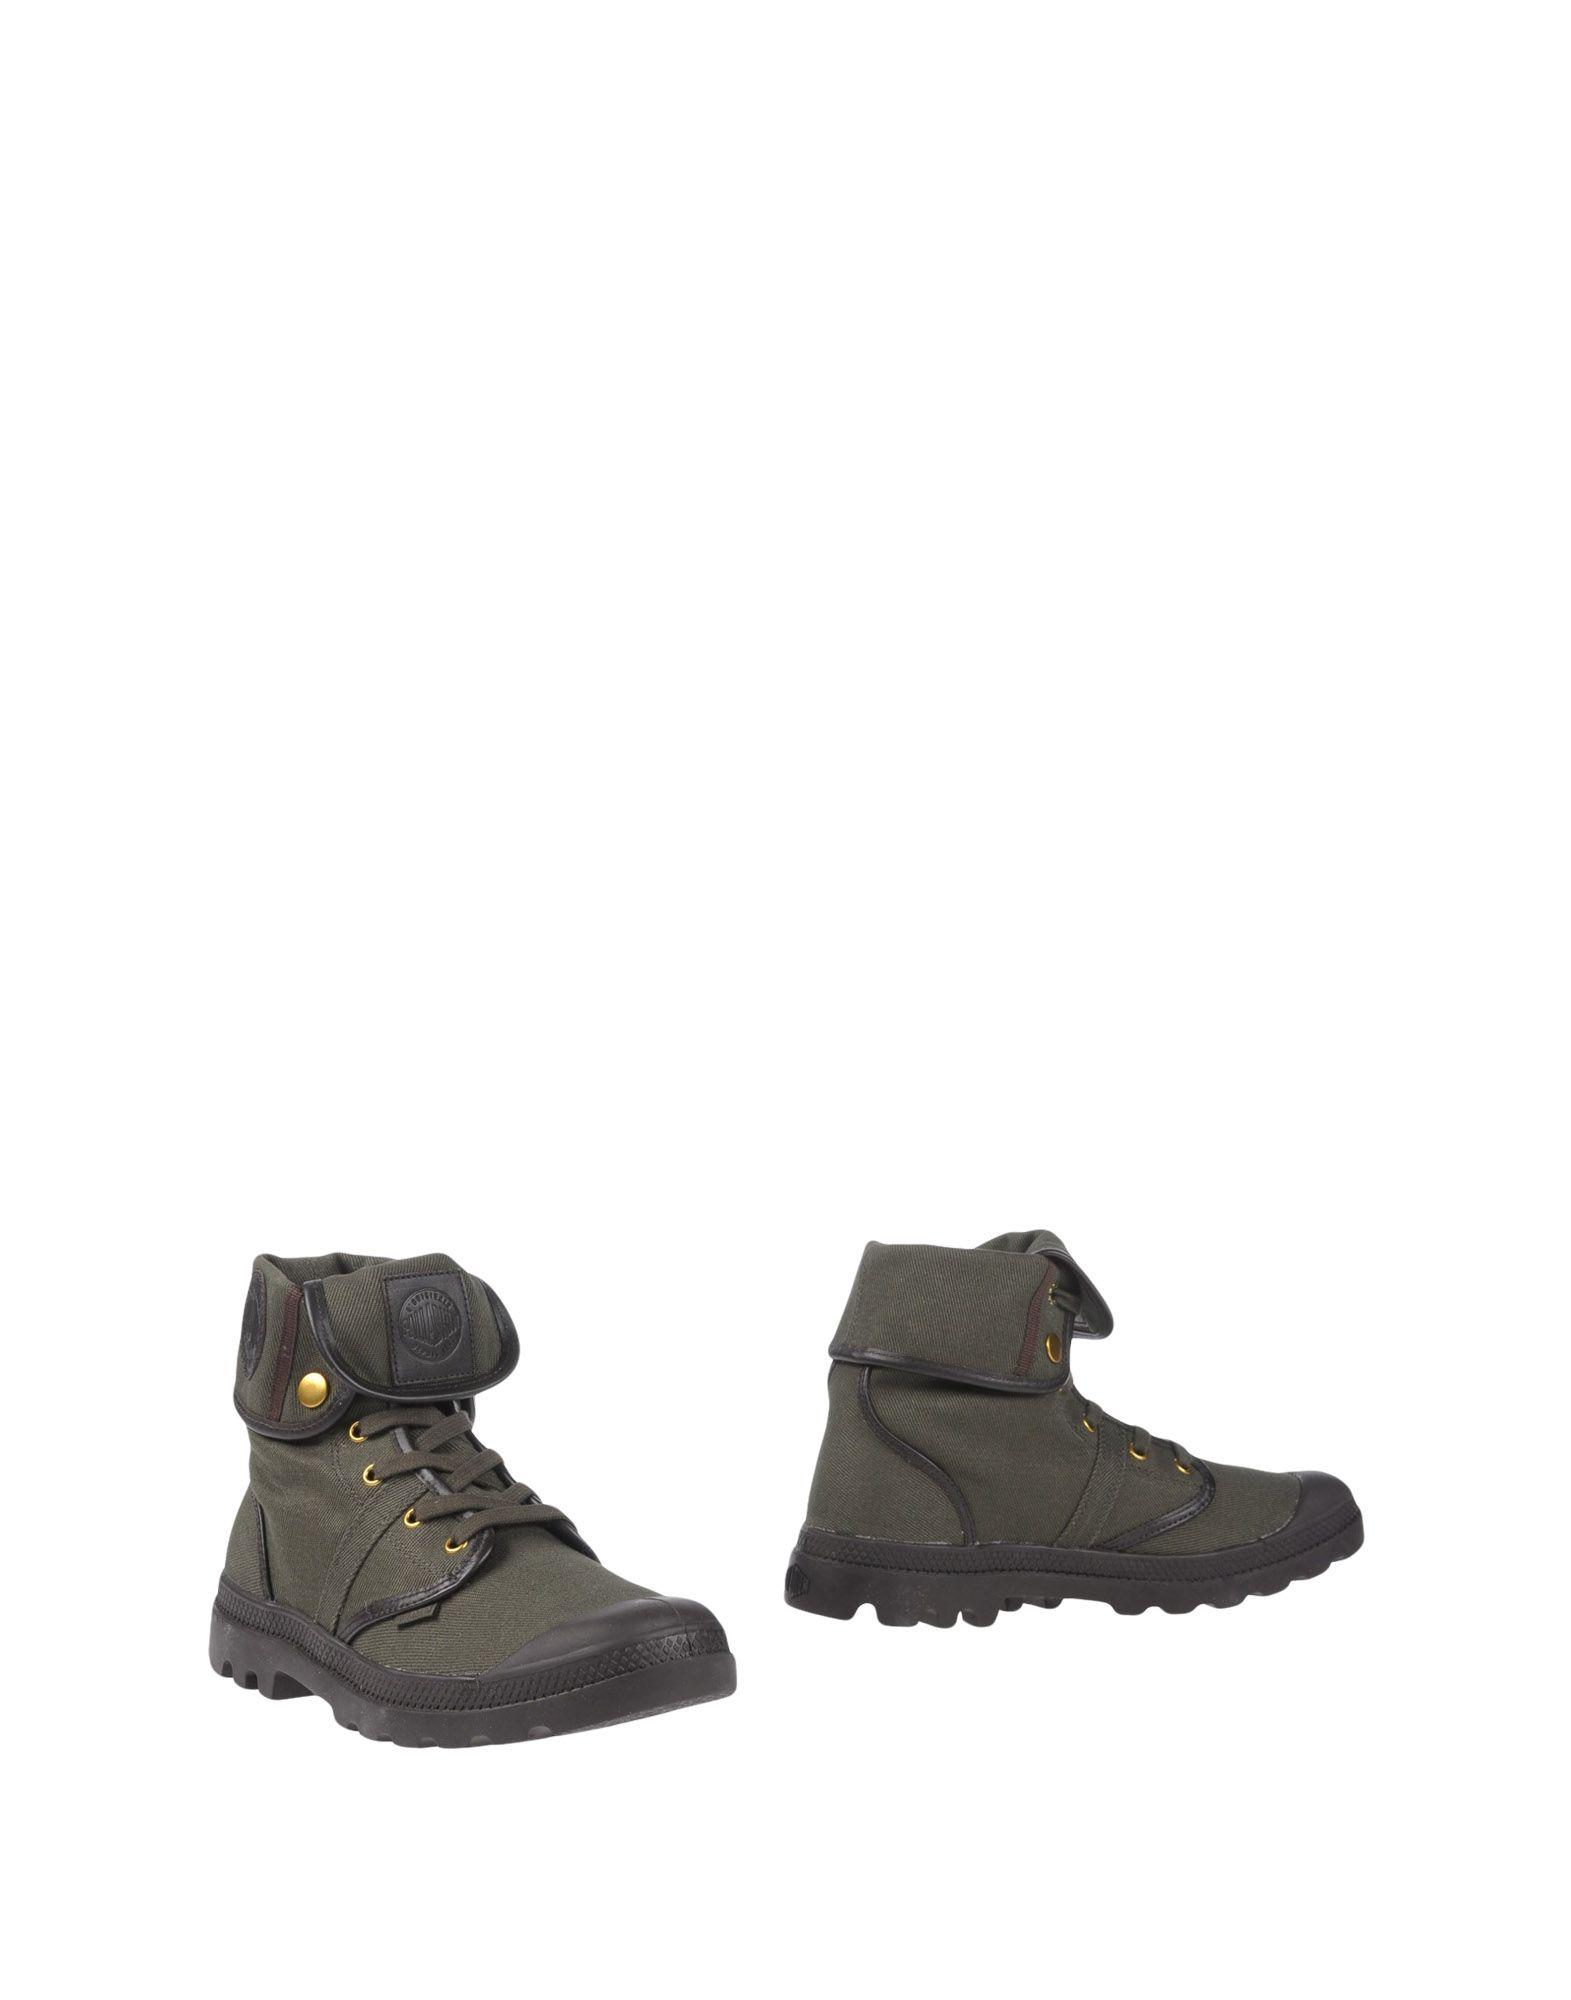 PALLADIUM Полусапоги и высокие ботинки ботинки высокие palladium pampa sport cuff wp amber gold mid gum